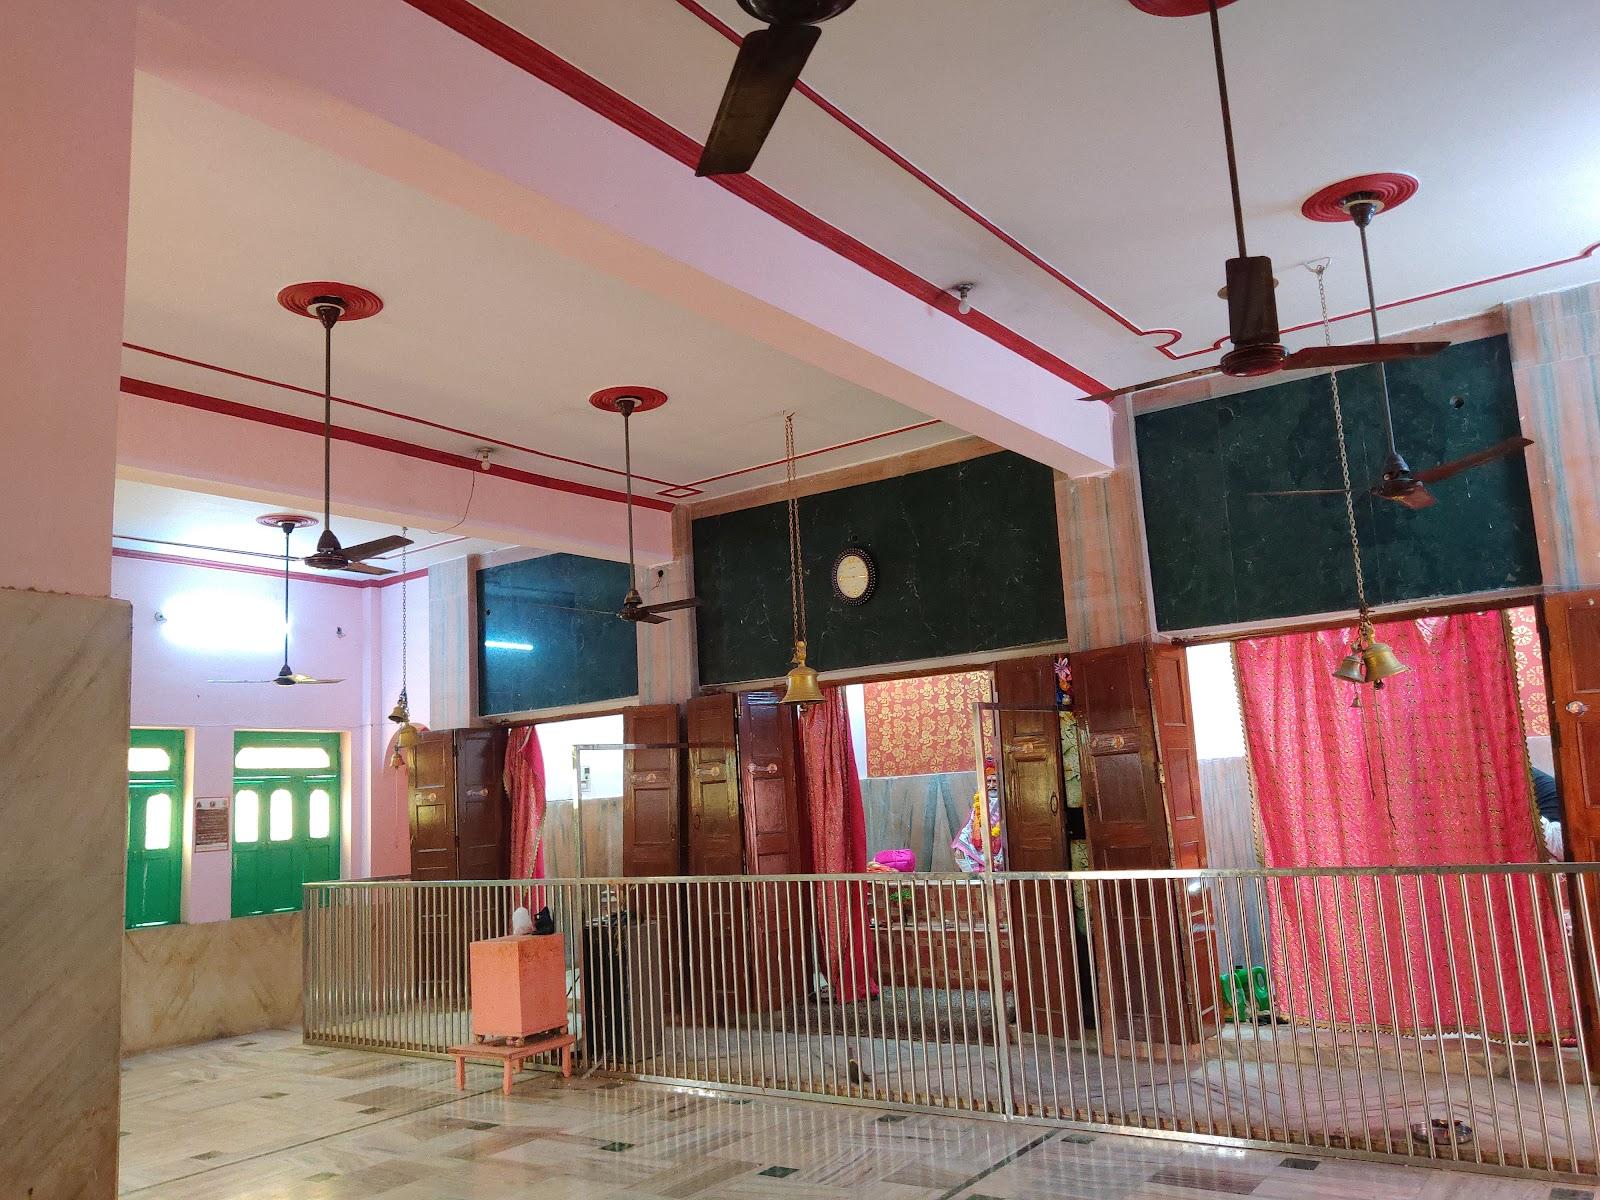 Neeb Karori Baba Temple Akabarpur (U.P)